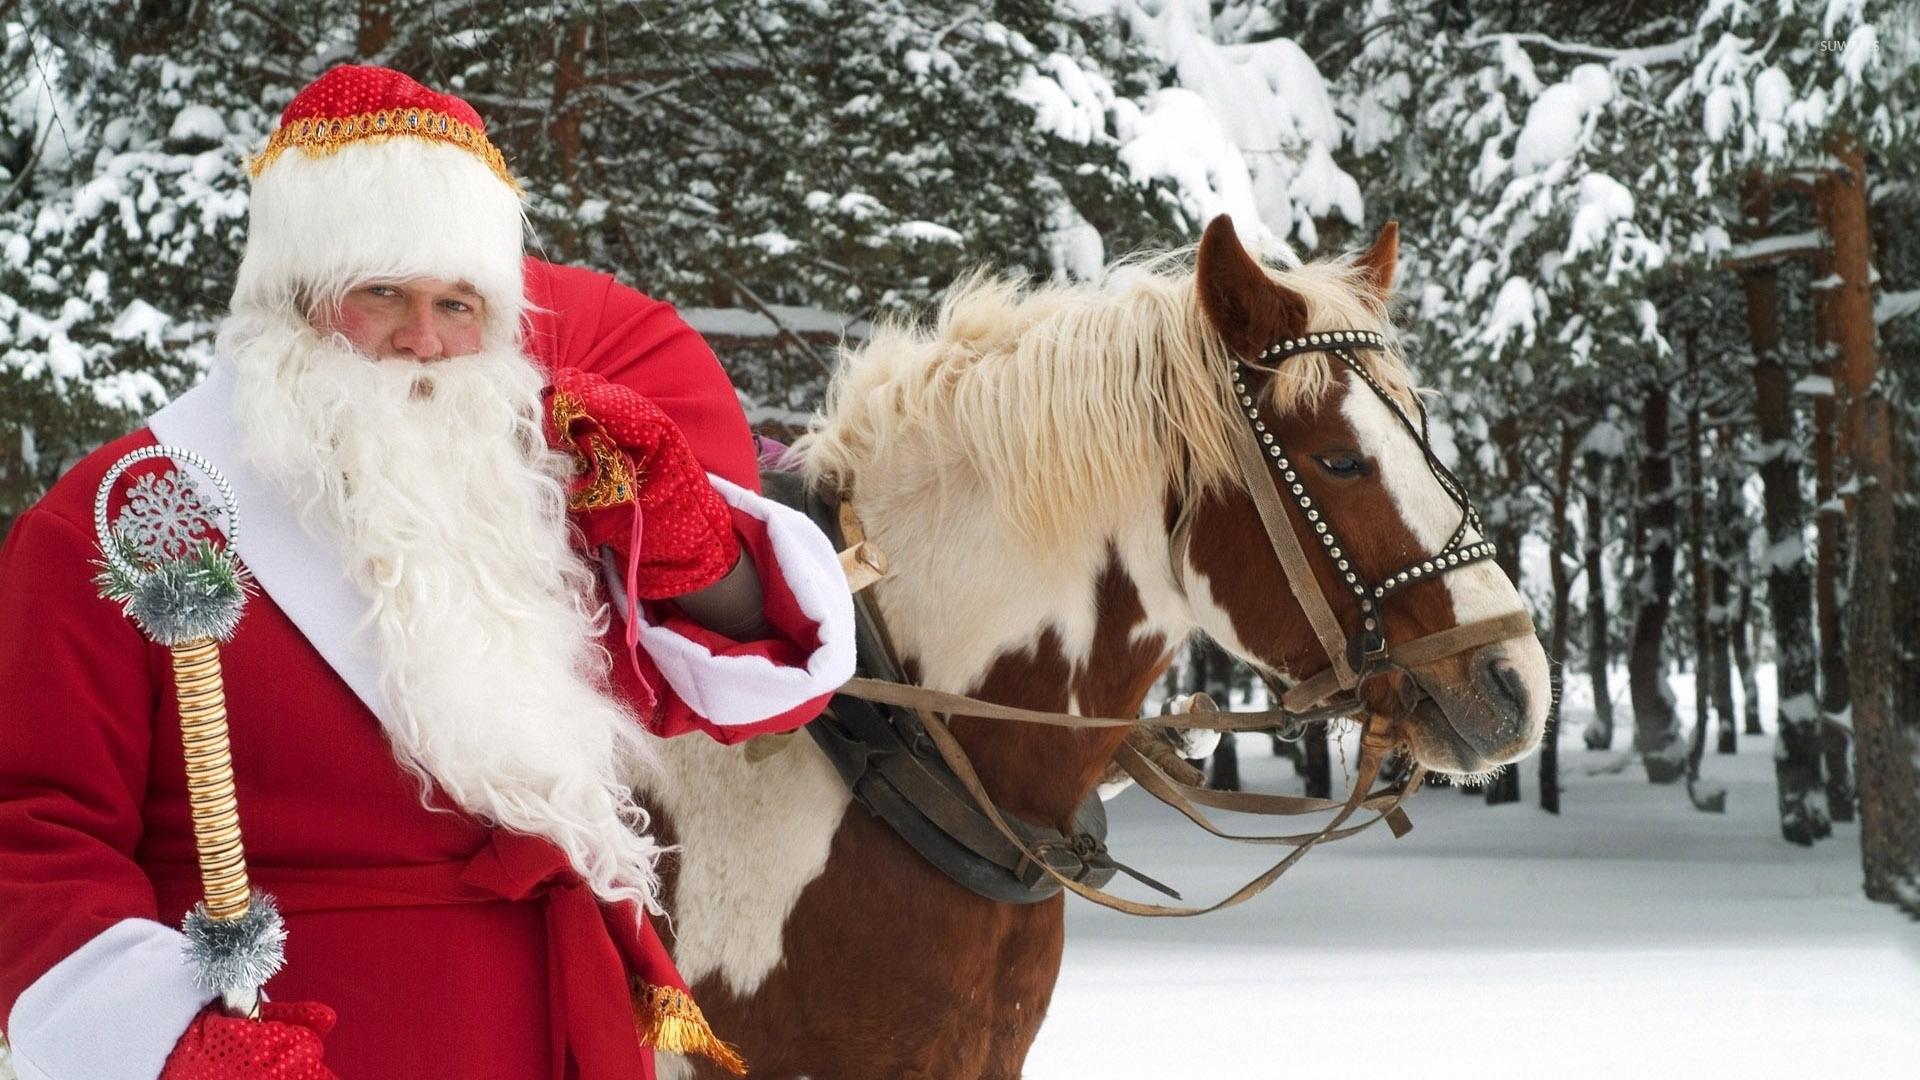 christmas sleigh horses 1920x1080 wallpaper - photo #17